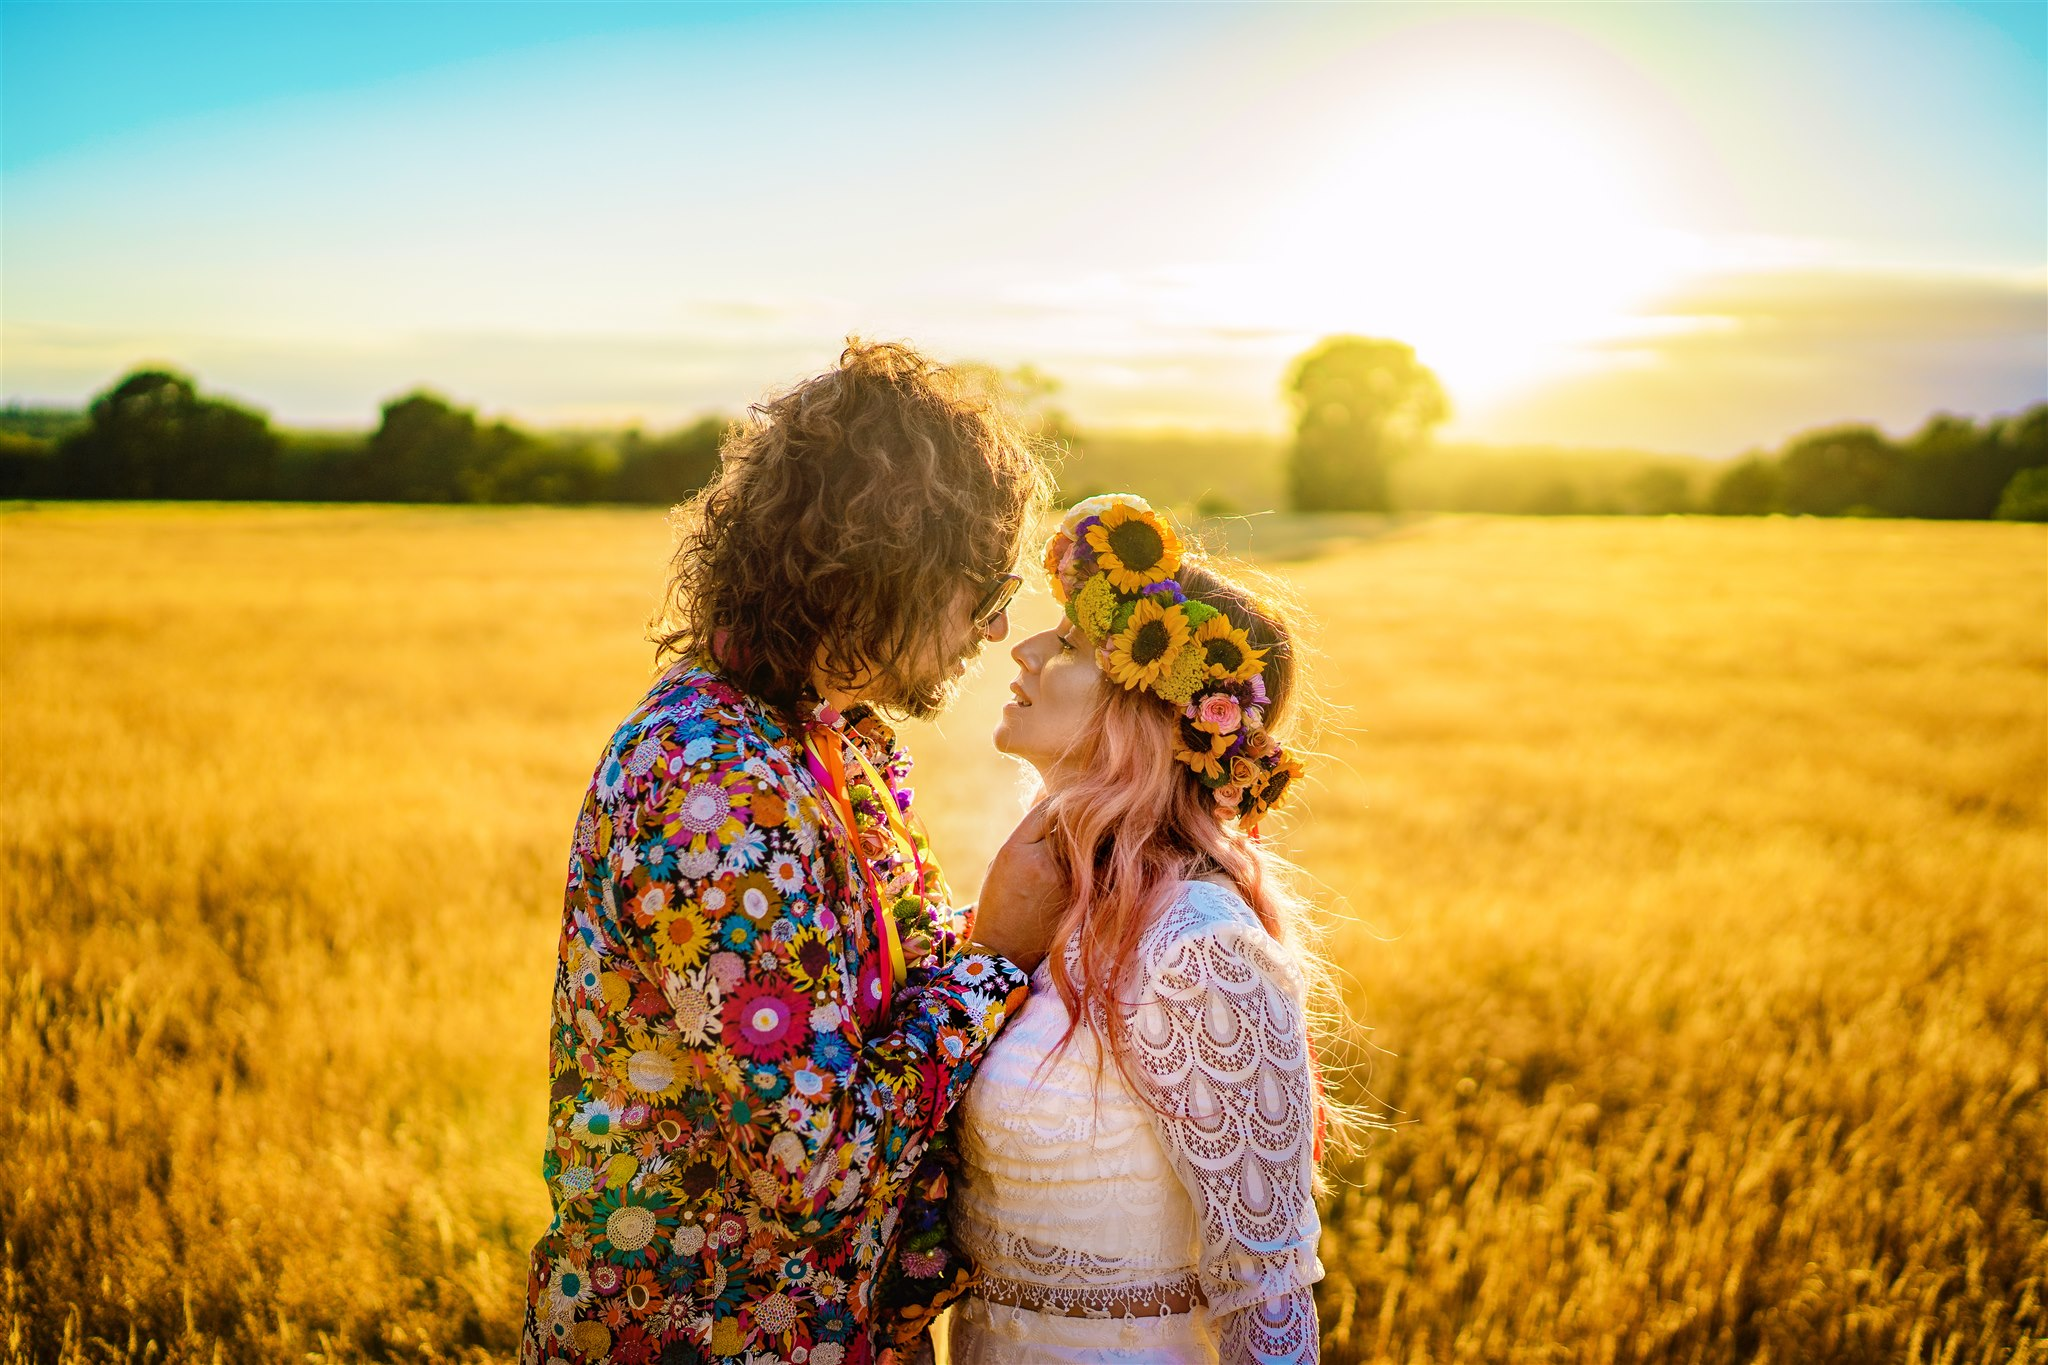 colourful bohemian wedding - 70s wedding - campervan wedding - hippie wedding - hippie bride and groom